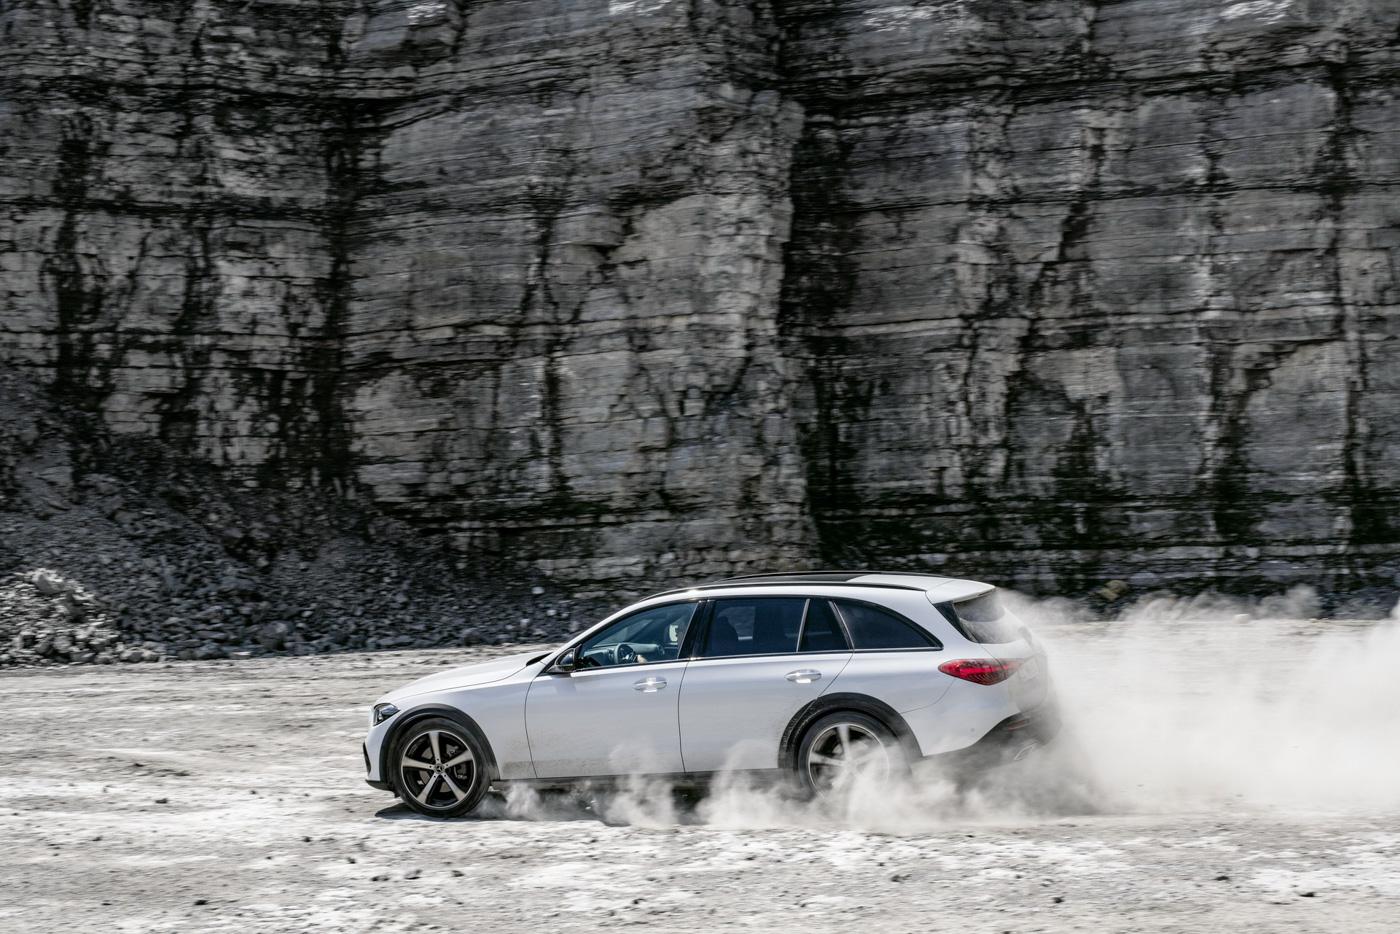 Mercedes-benz-c-class-all-terrain-di-den-moi-noi-cung-mau-xe-gia-dinh-day-thuc-dung (15).JPG